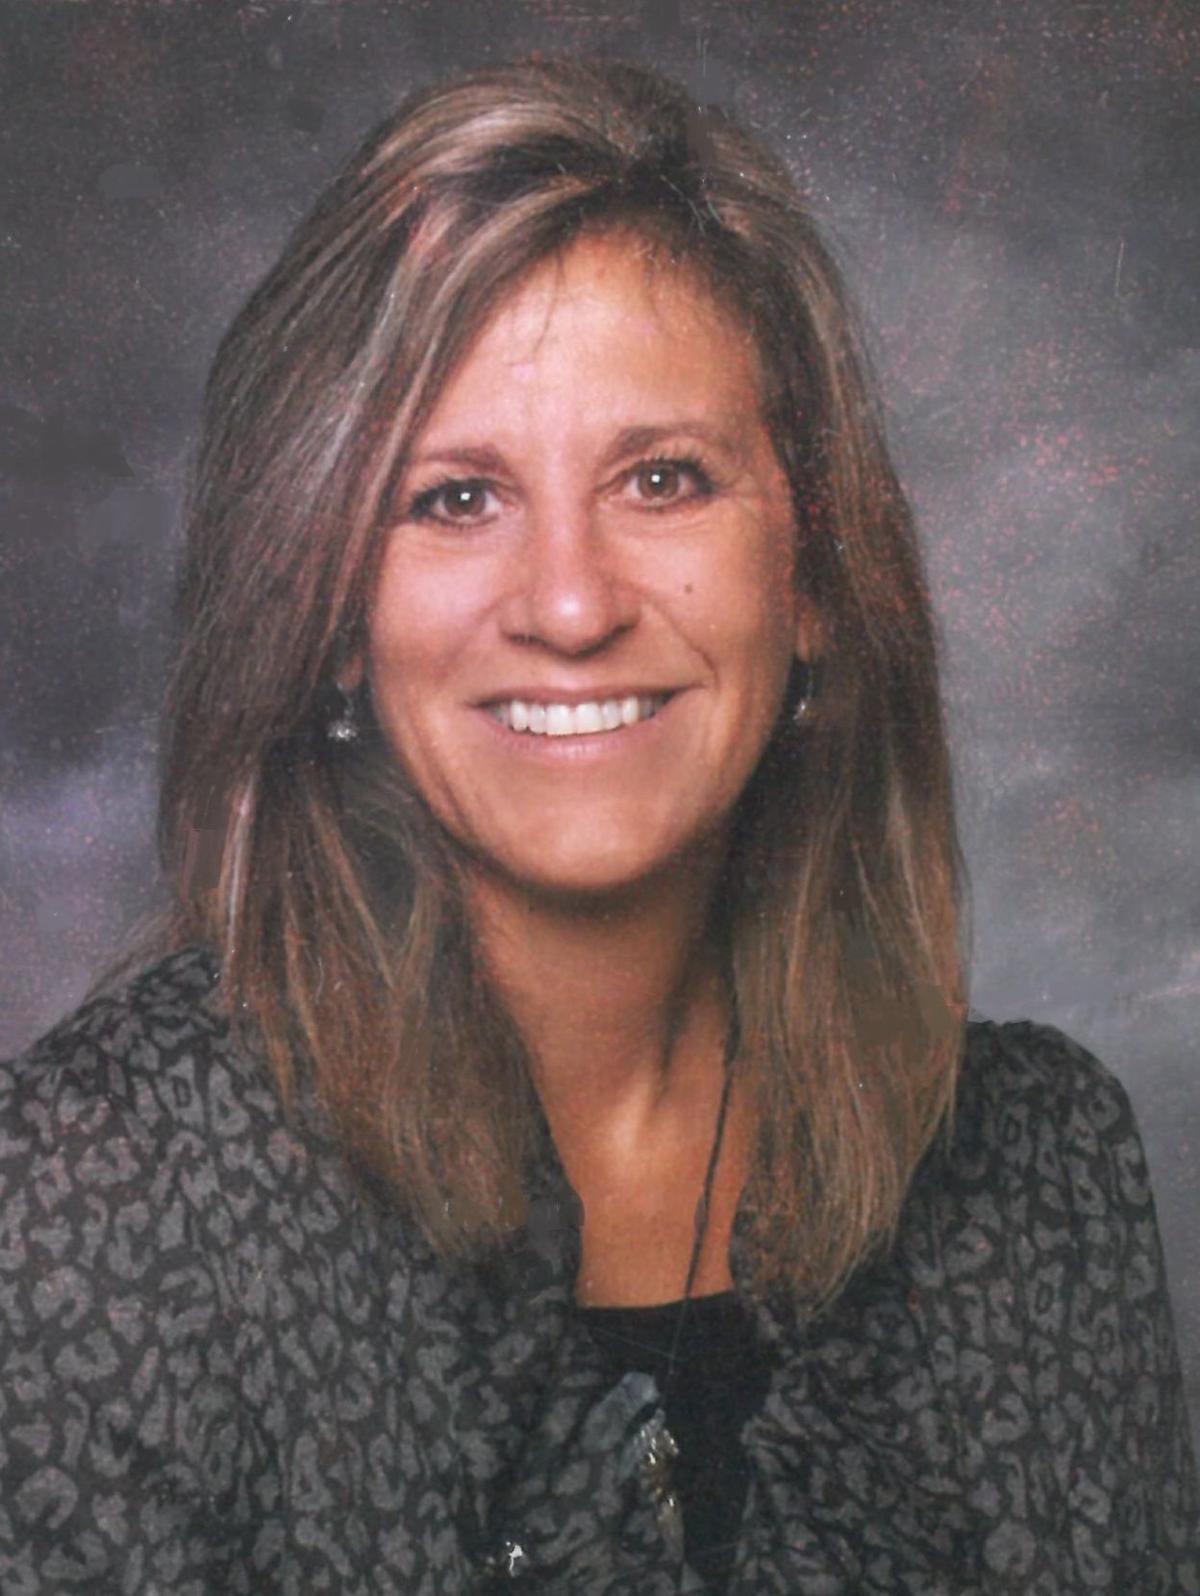 Obituary: Beth Olmstead